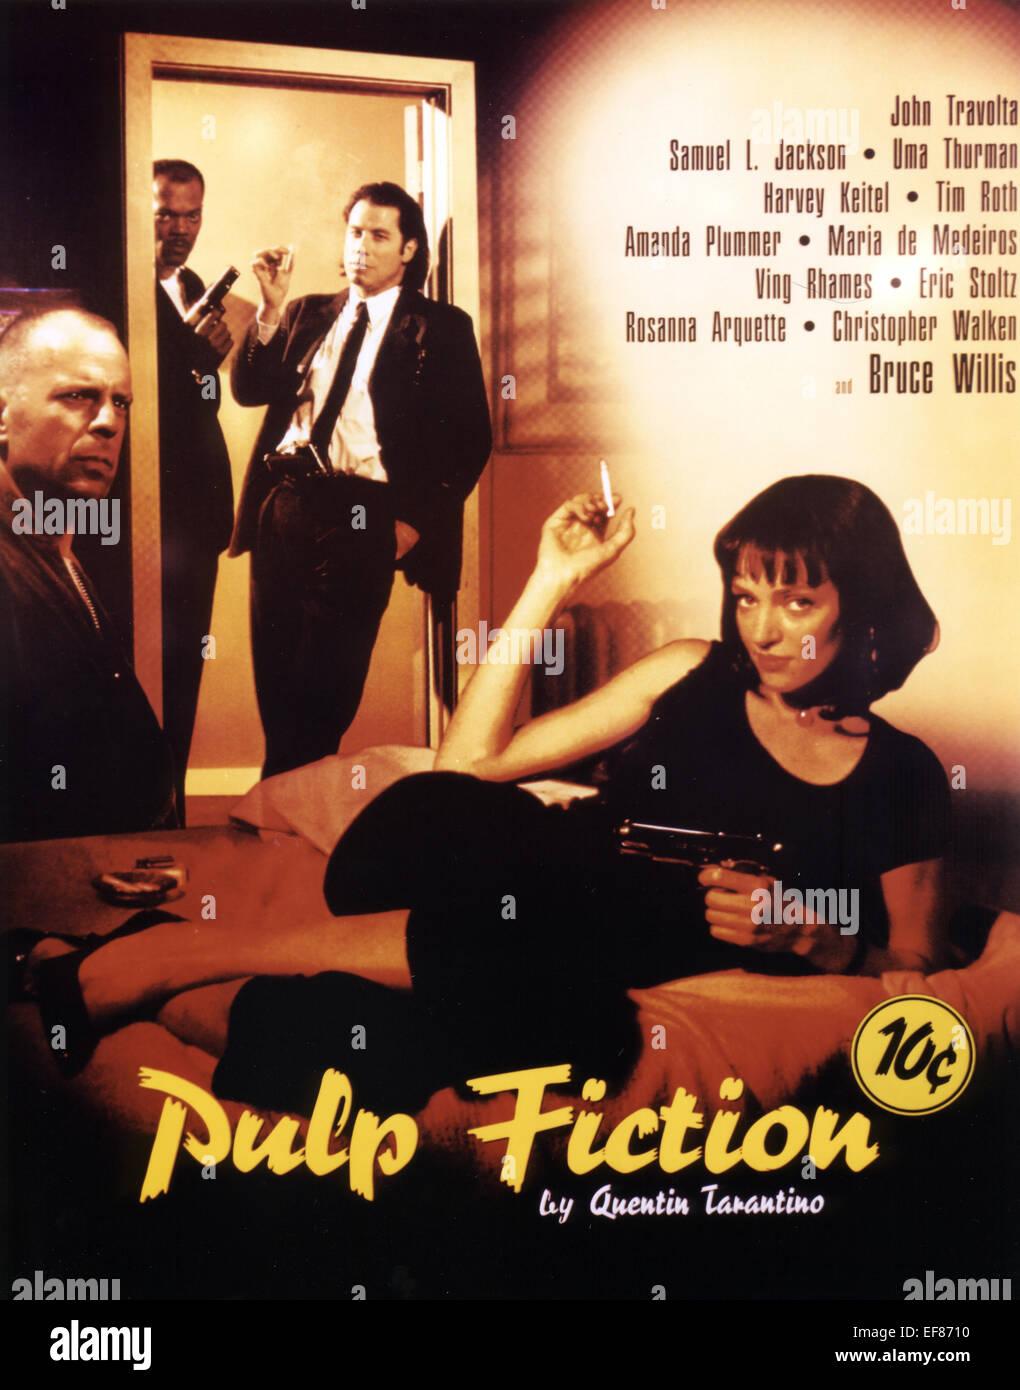 Movie Poster Pulp Fiction 1994 Stock Photo Alamy